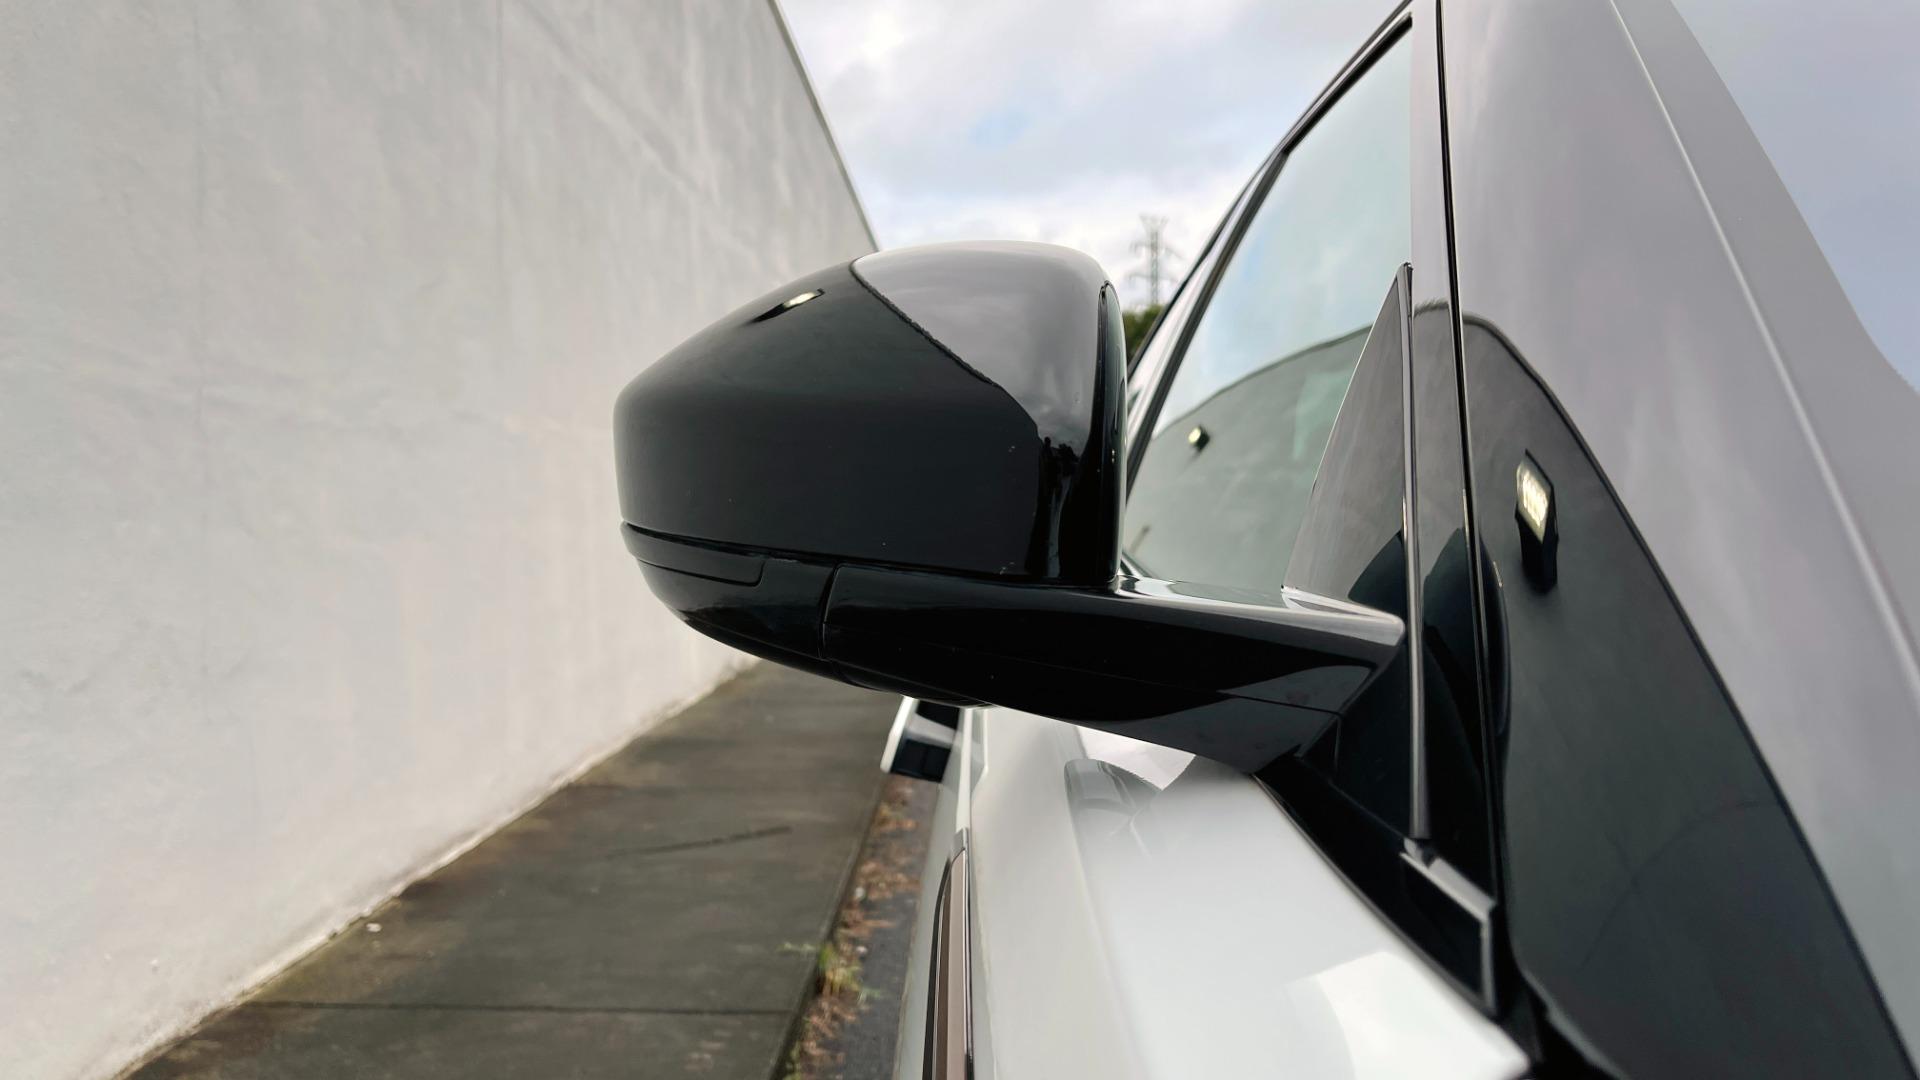 Used 2018 Land Rover RANGE ROVER VELAR R-DYNAMIC SE / NAV / PREM / MERIDIAN / SUNROOF / REARVIEW for sale $54,995 at Formula Imports in Charlotte NC 28227 14